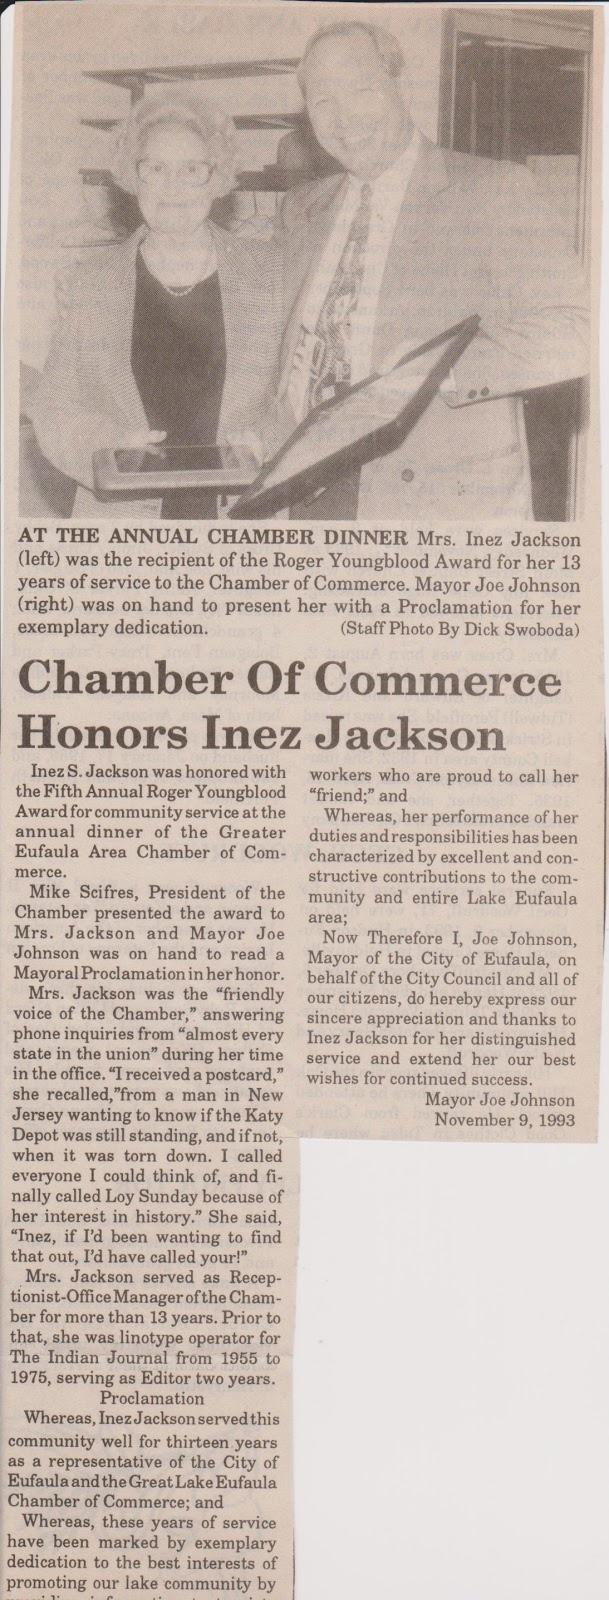 Joe Johnson | Eufaula, Oklahoma: Mayor Joe Johnson presents Mrs. Inez Jackson with a Proclamation for her exemplary dedication